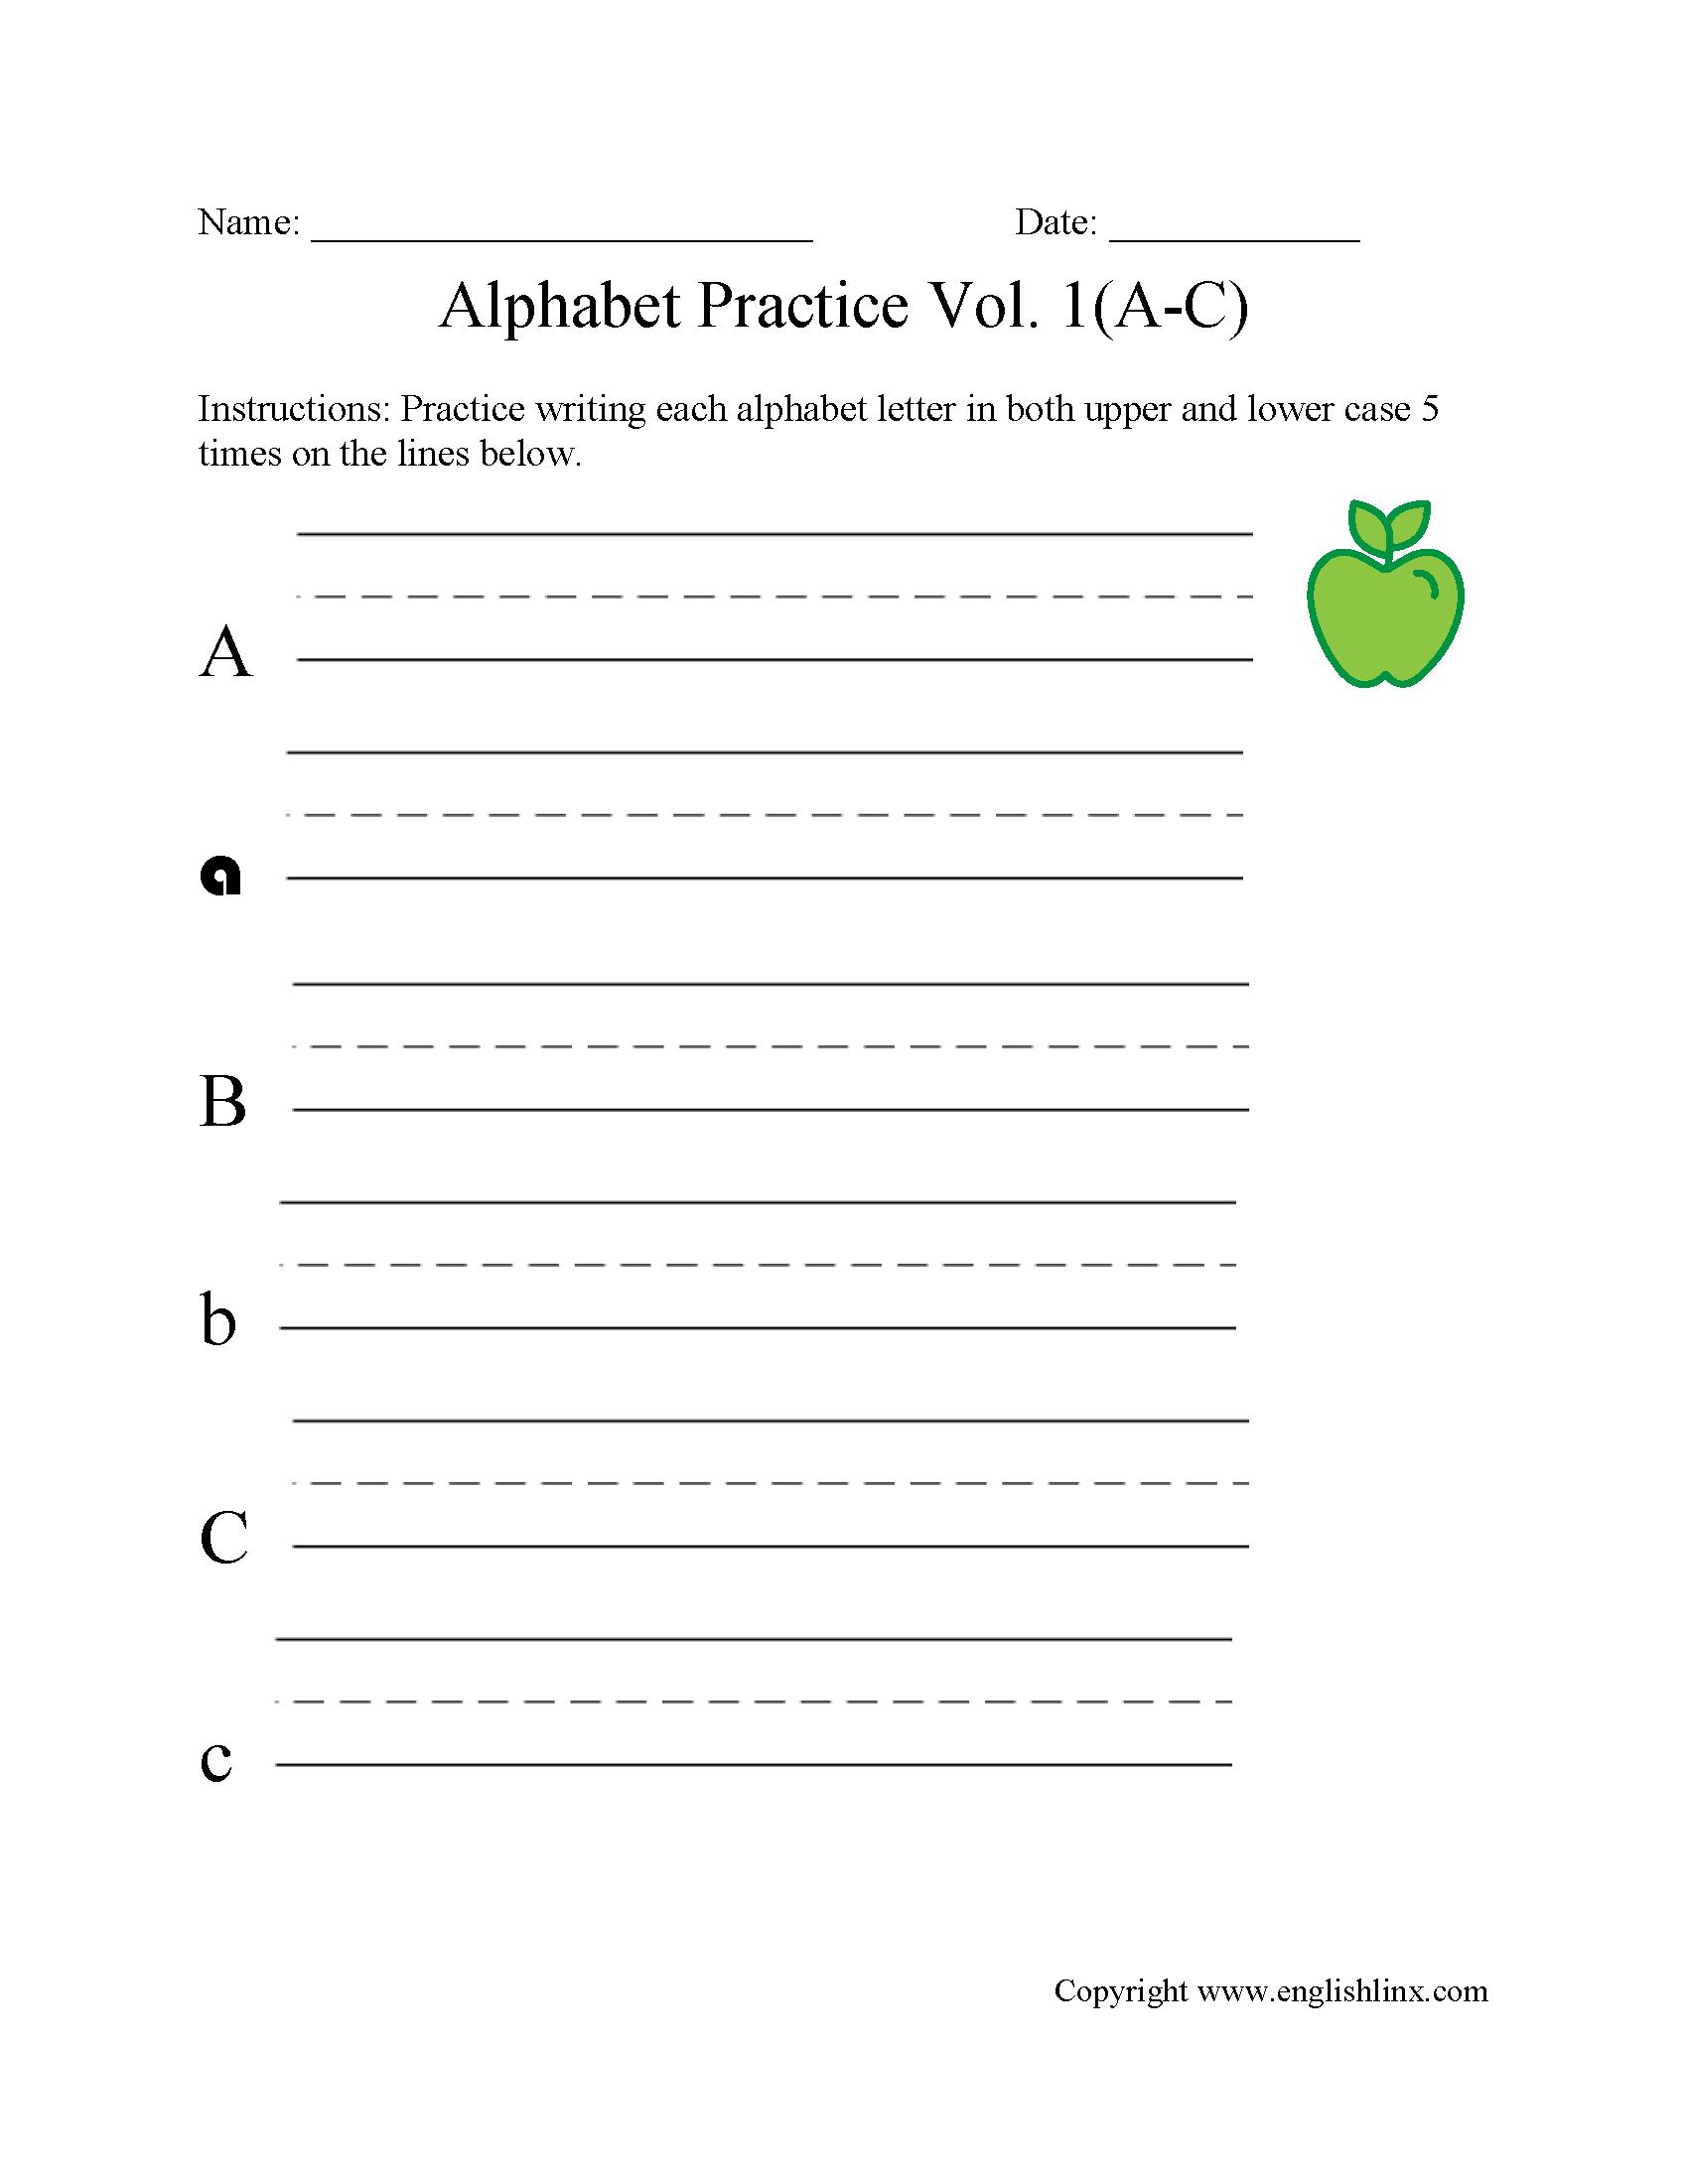 Alphabet Worksheets | Writing The Alphabet Worksheets - Free Printable Alphabet Worksheets For Grade 1